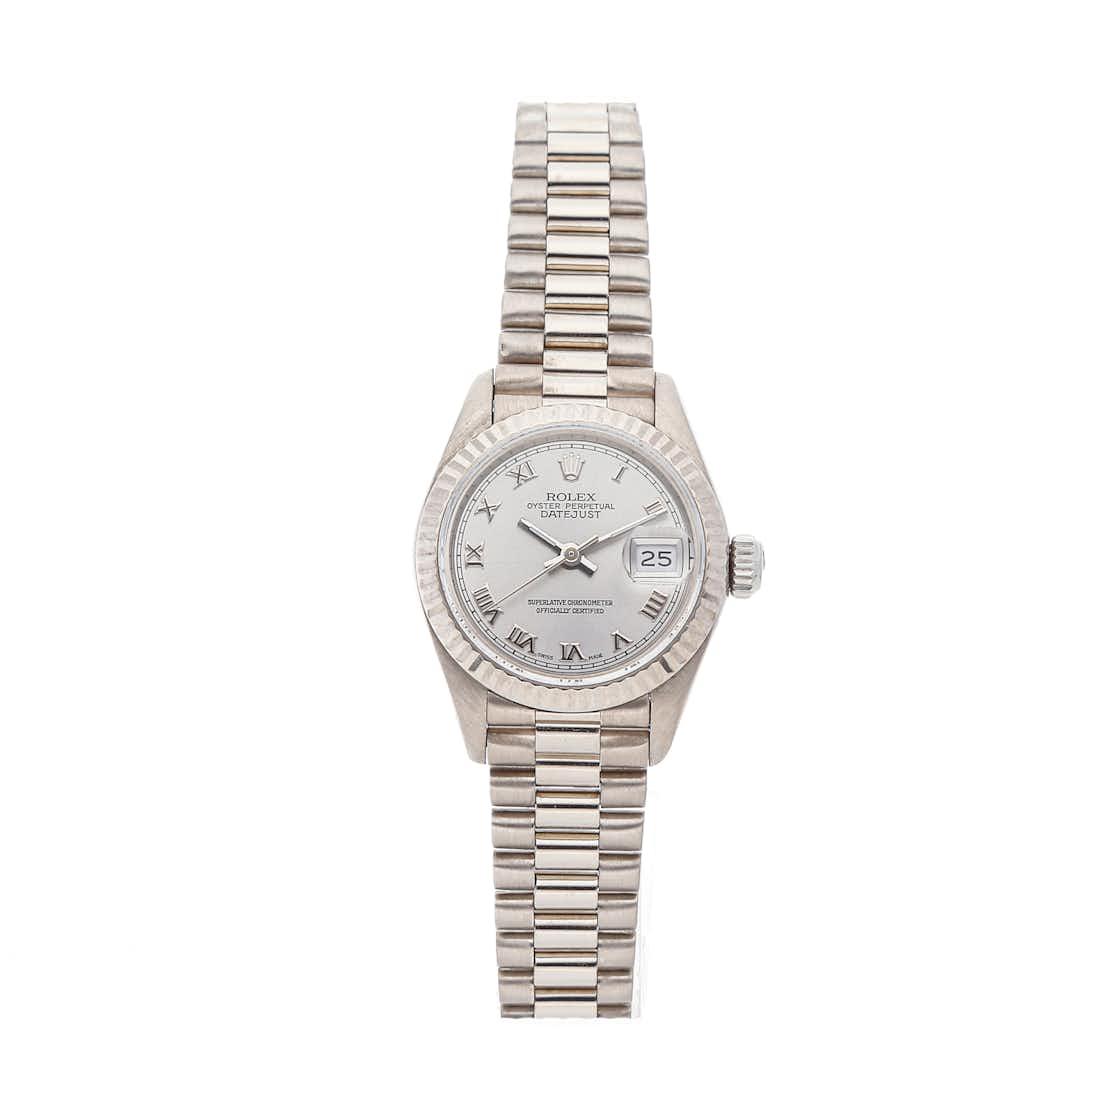 Rolex Datejust 69139